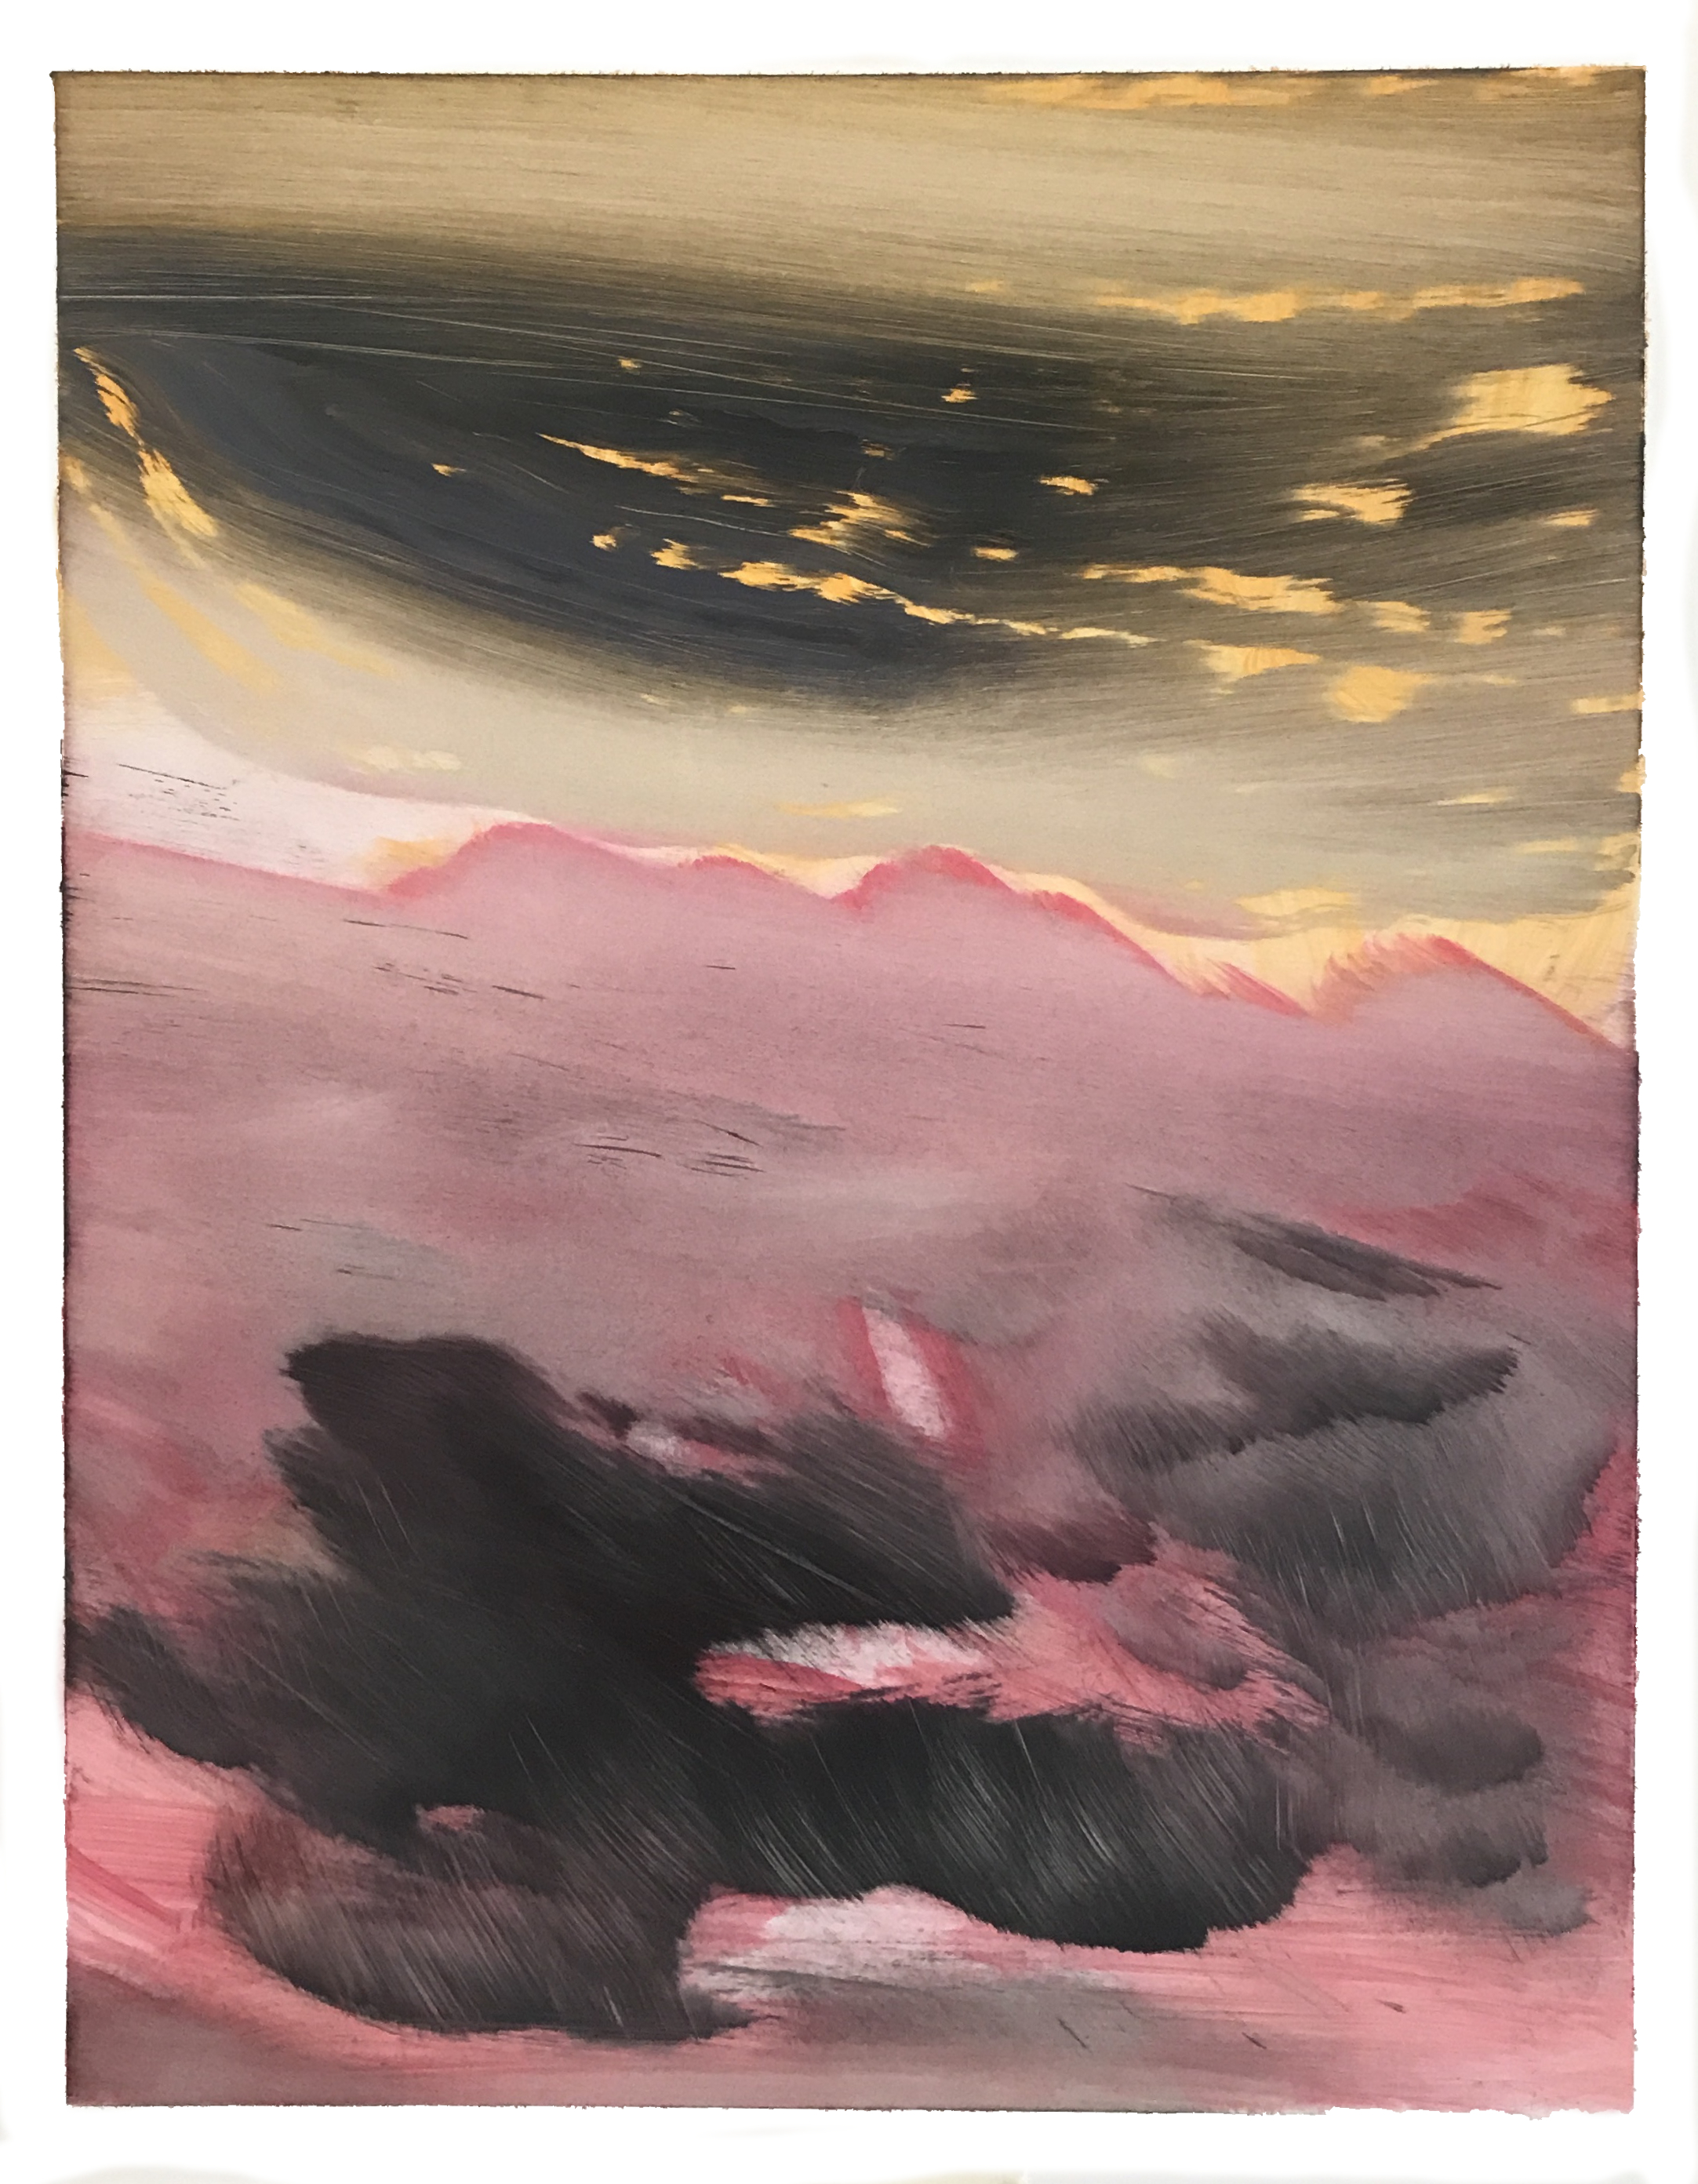 "O.T. (no.121), 11"" x 14"", oil on paper, 2018"